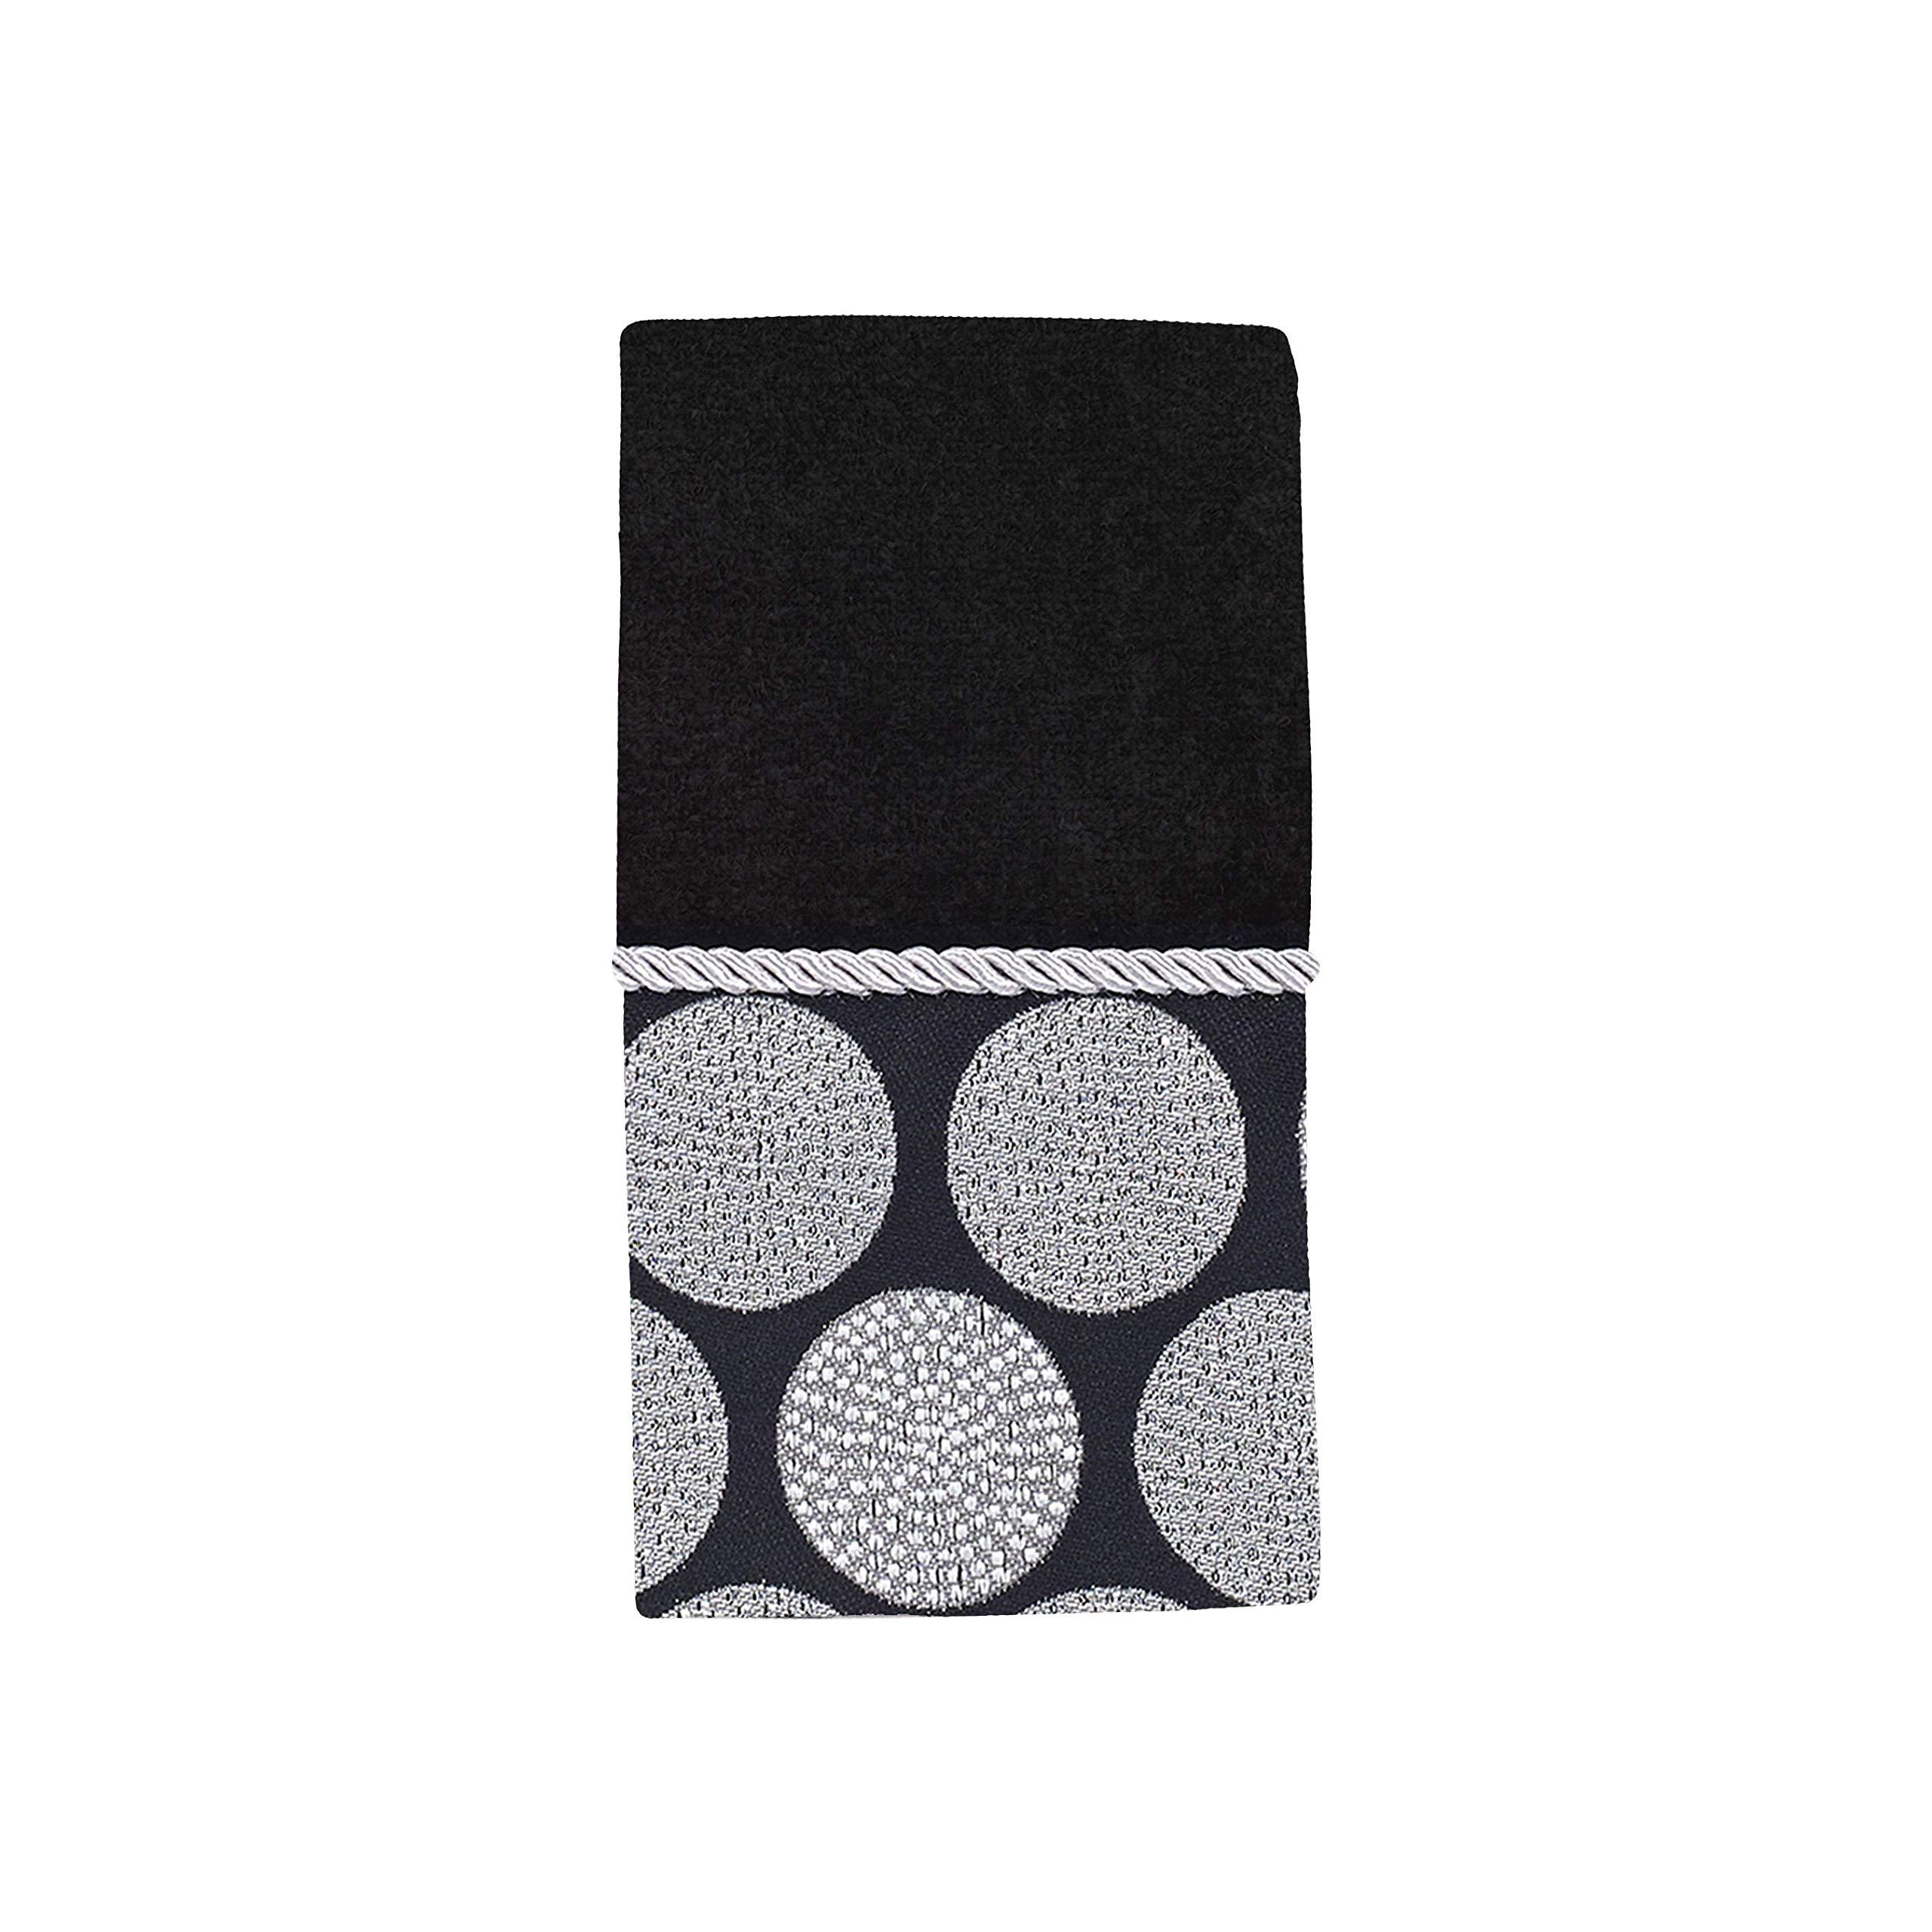 Avanti Linens Dotted Circles FINGERTIP, Medium, Black